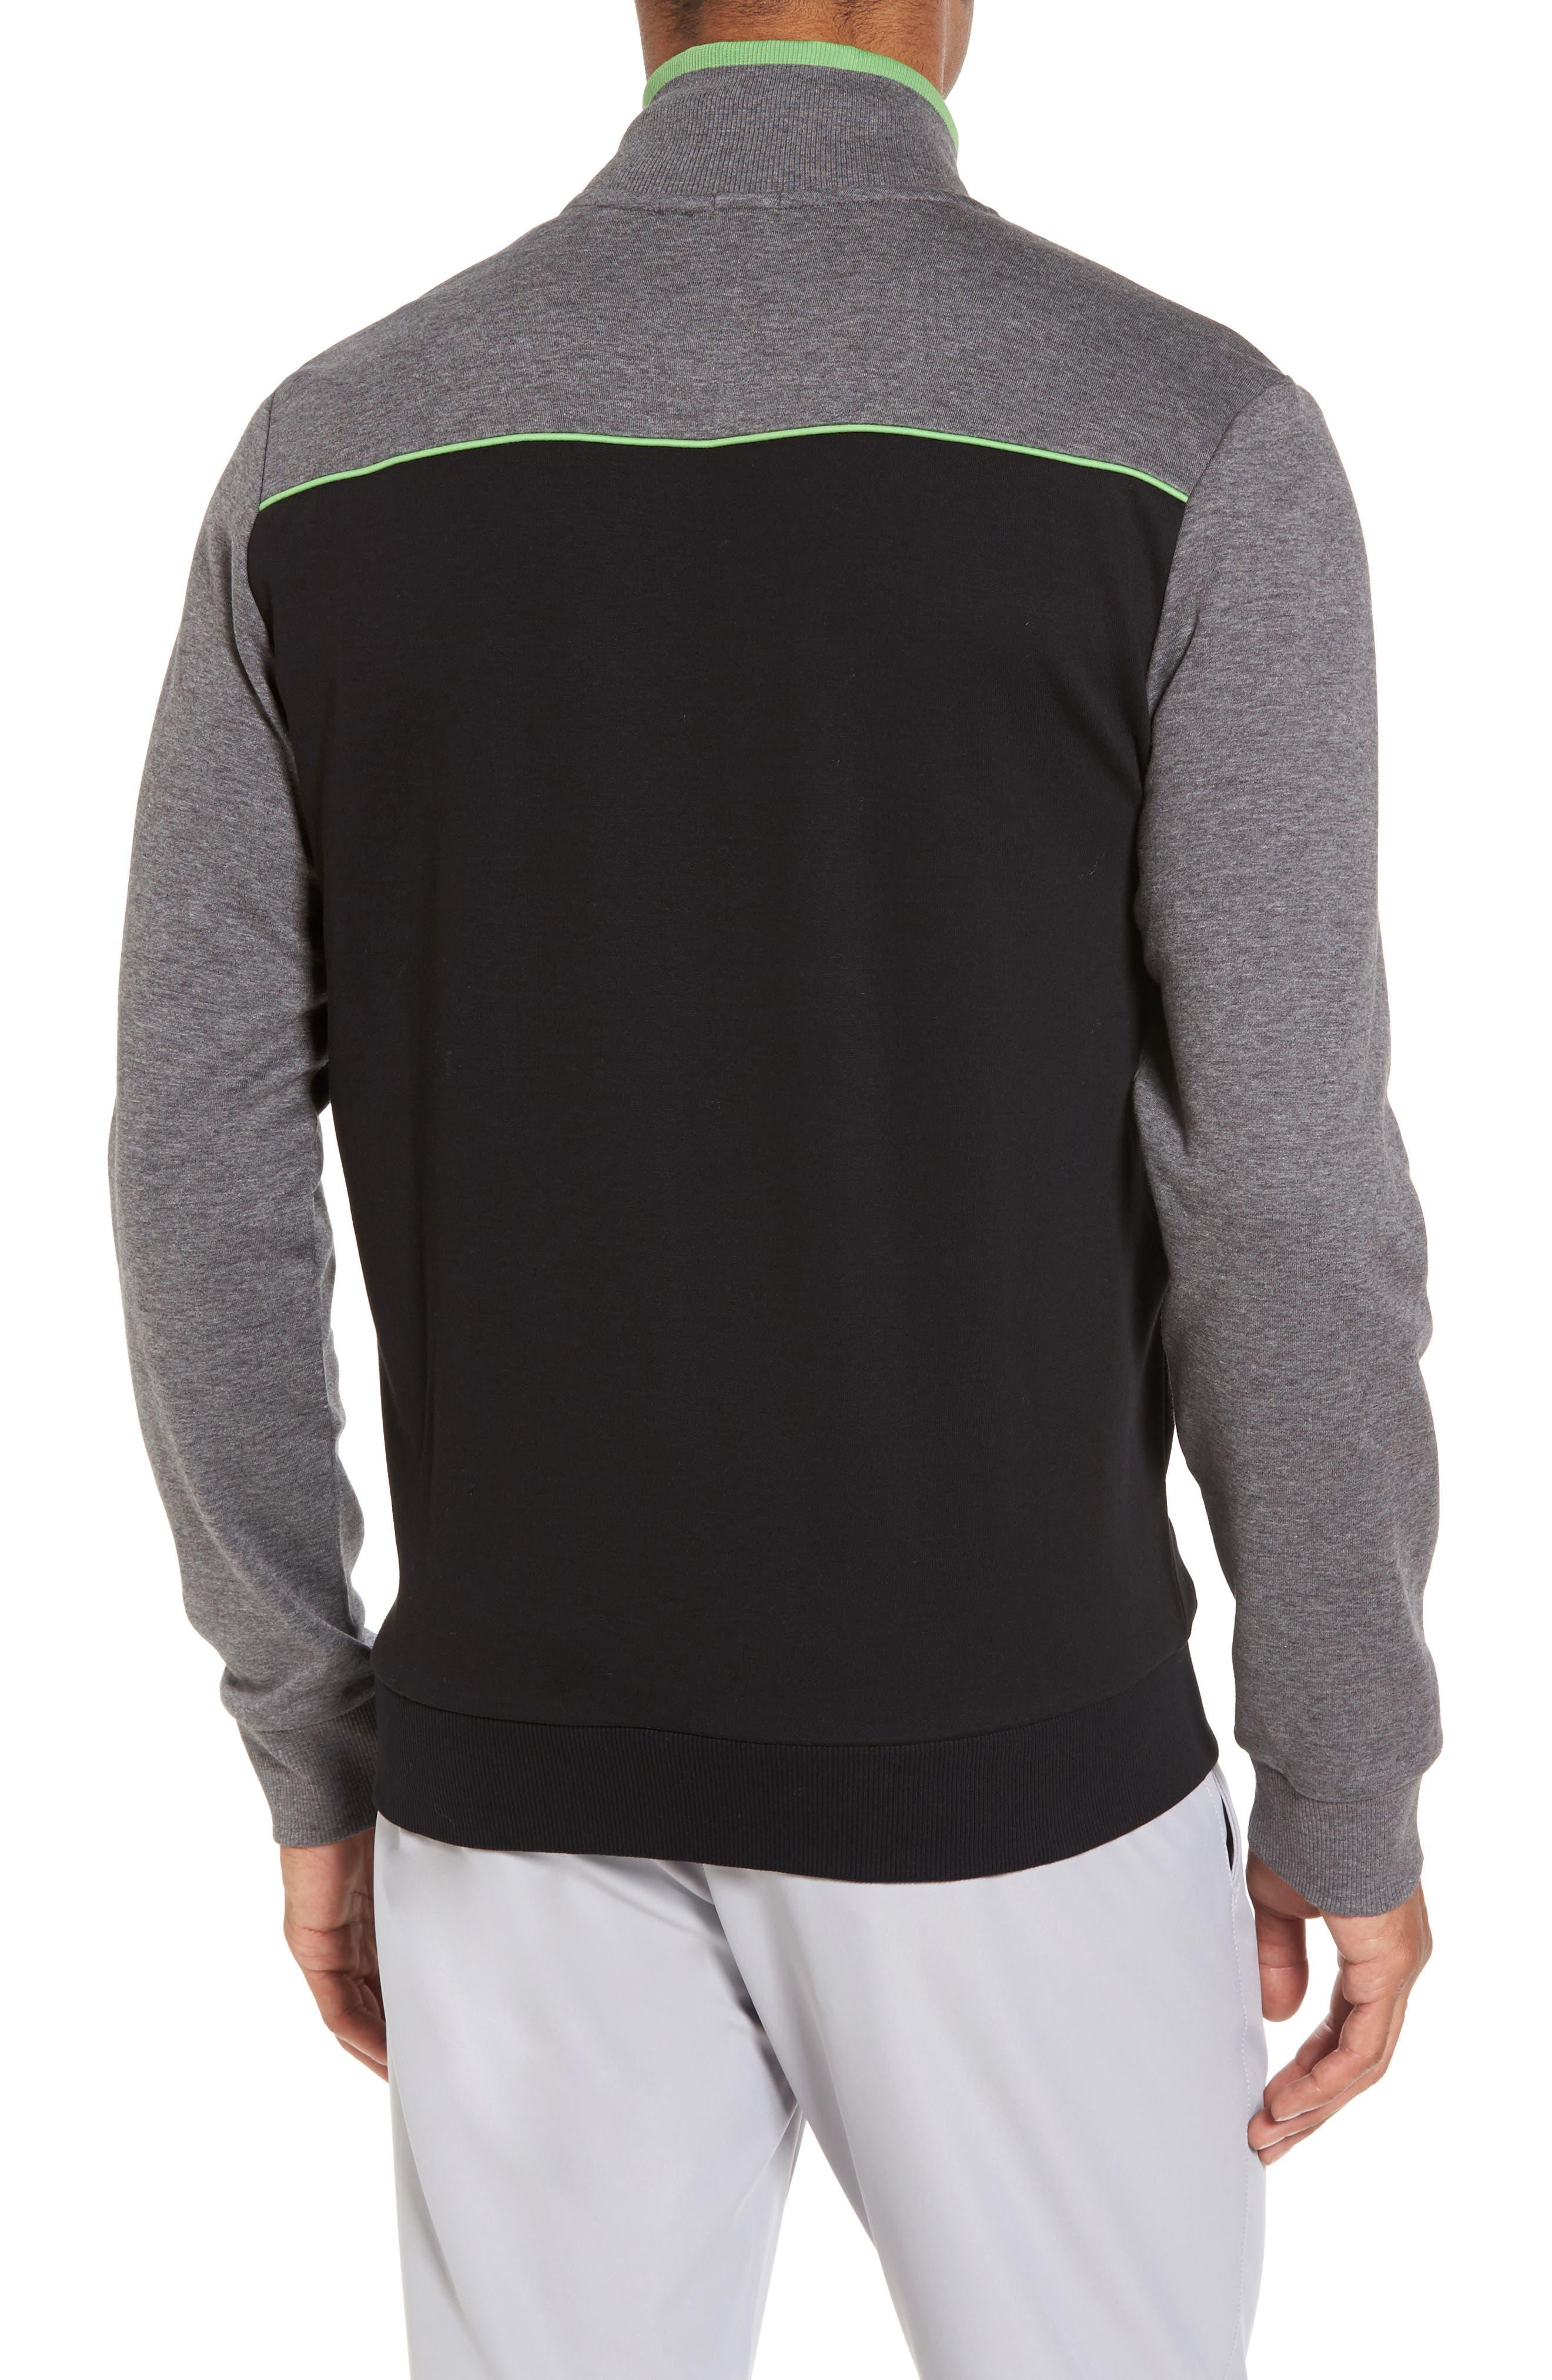 Skaz Full Zip Fleece Jacket,                             Alternate thumbnail 2, color,                             BLACK